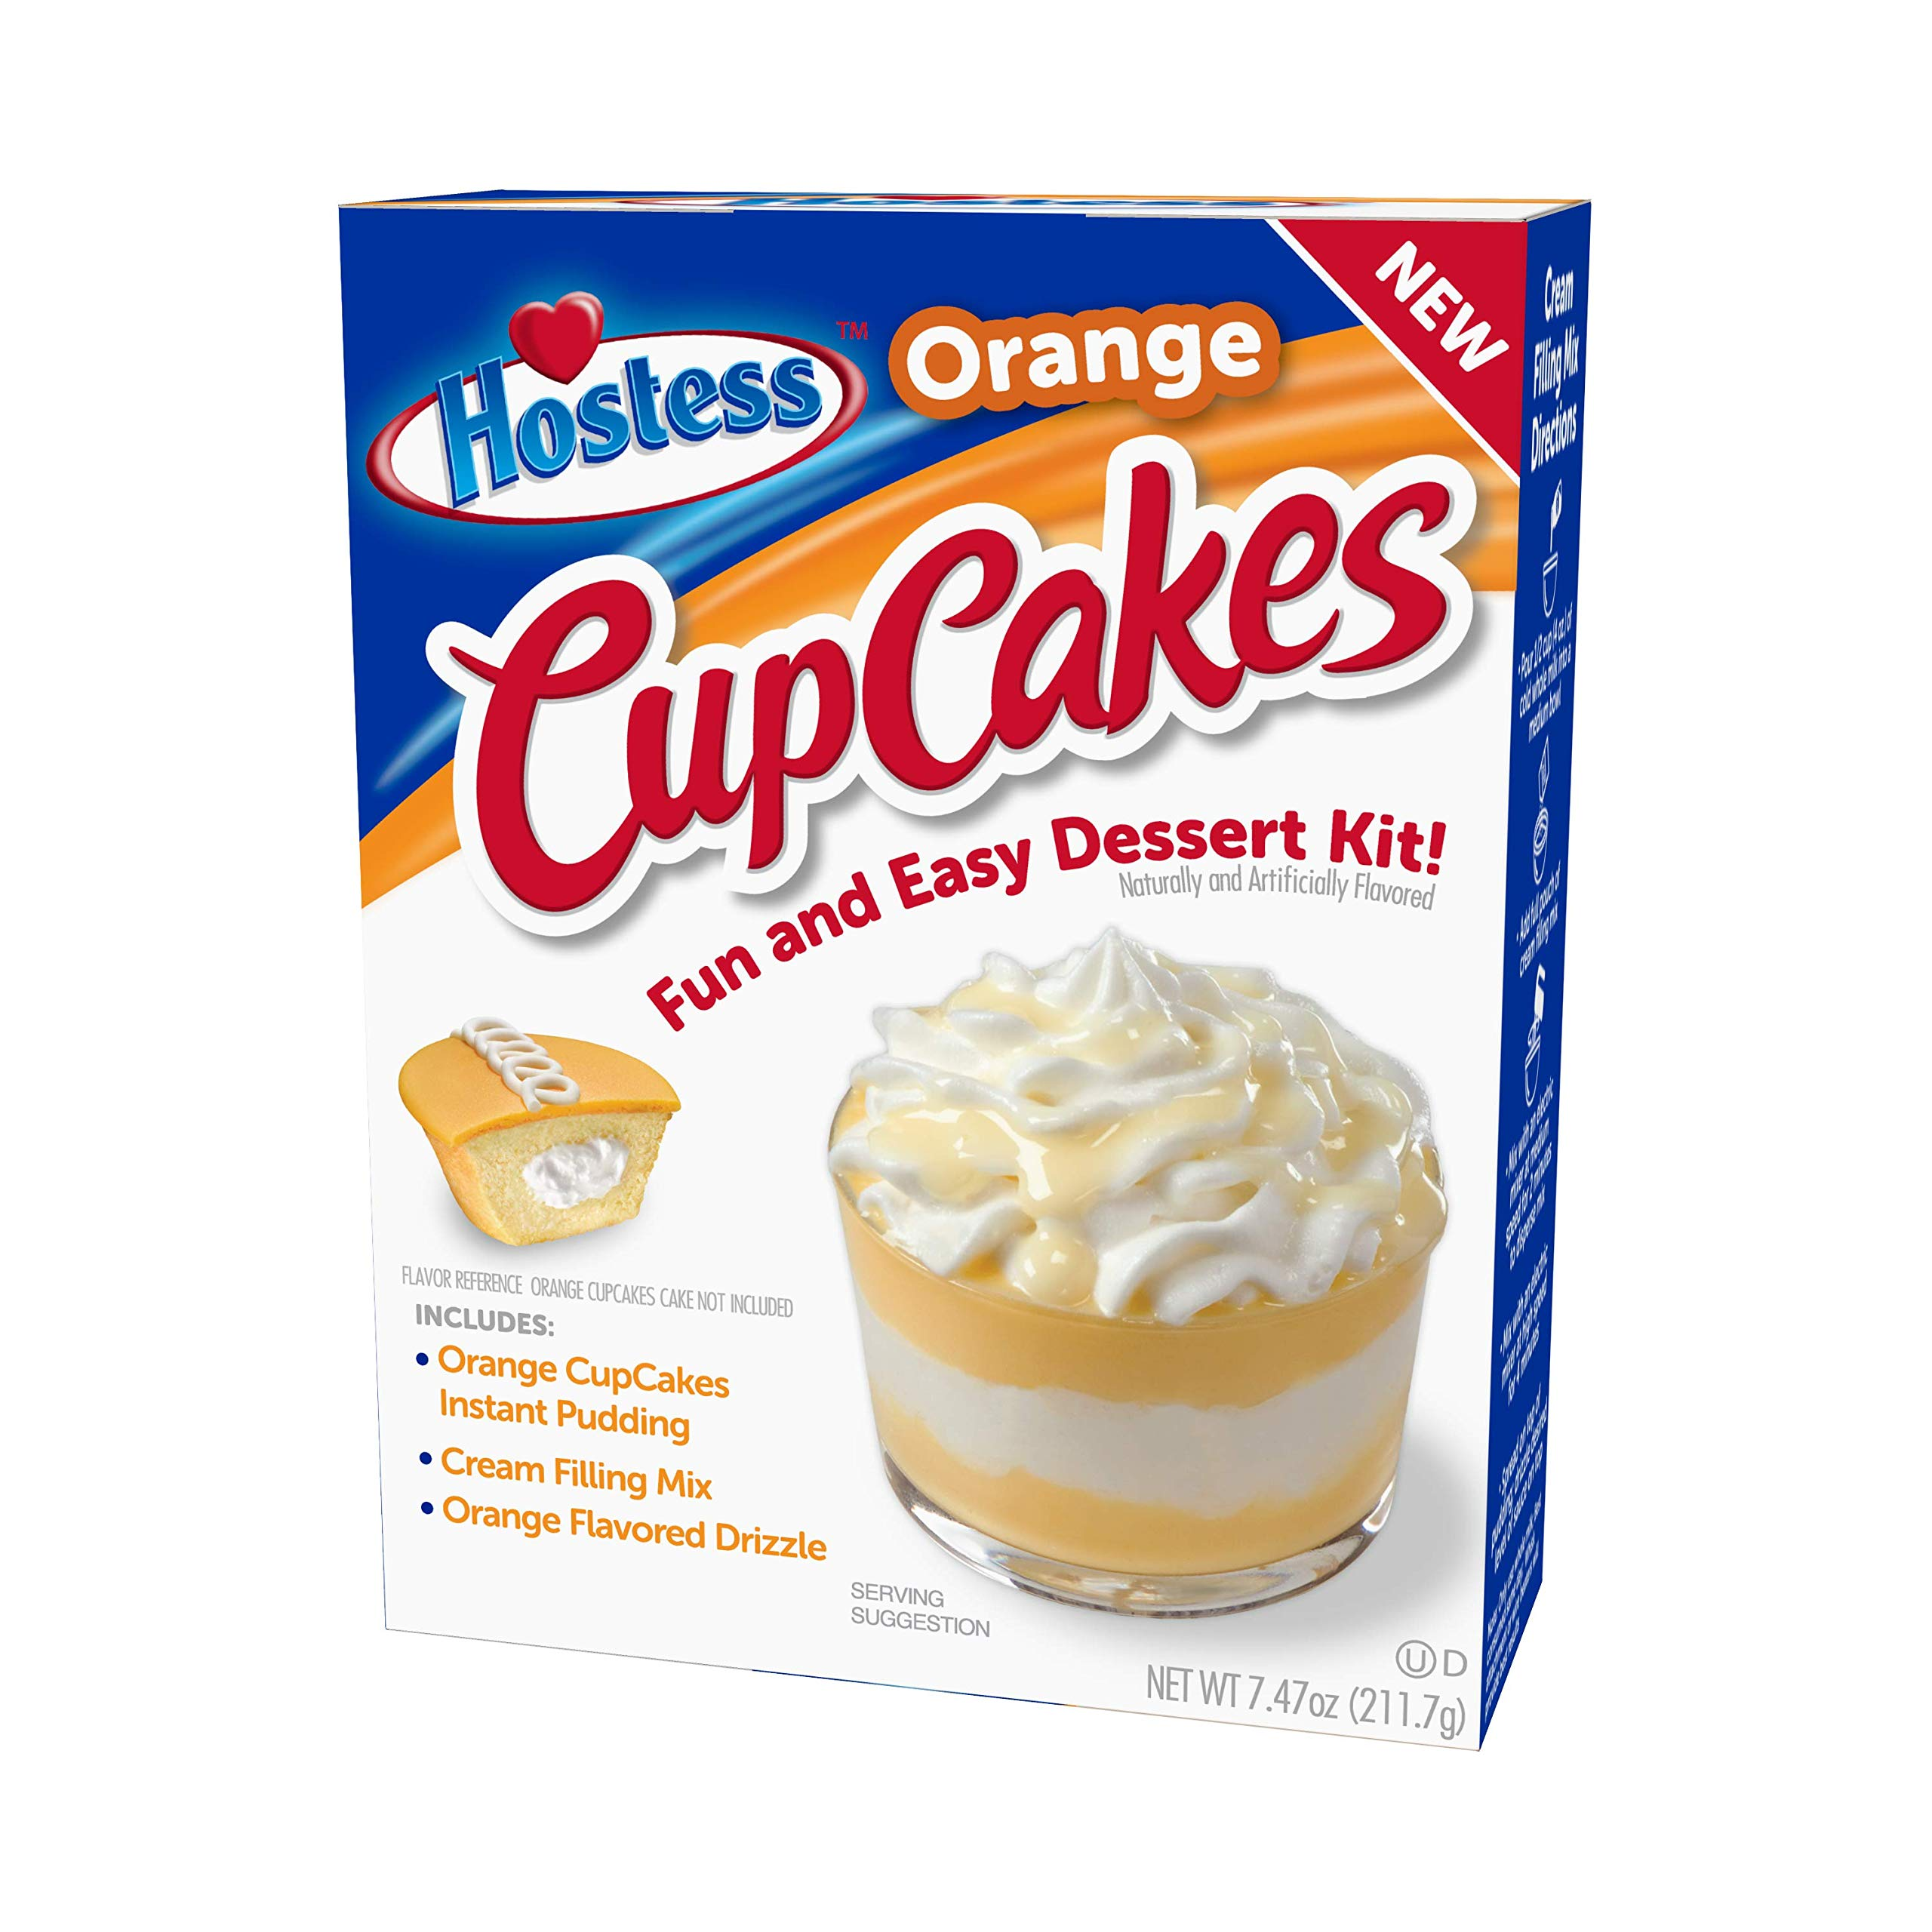 Hostess Orange Cupcakes Dessert Kit, 7.47 OZ, 6 CT (Orange CupCakes, Pack - 3) by Hostess